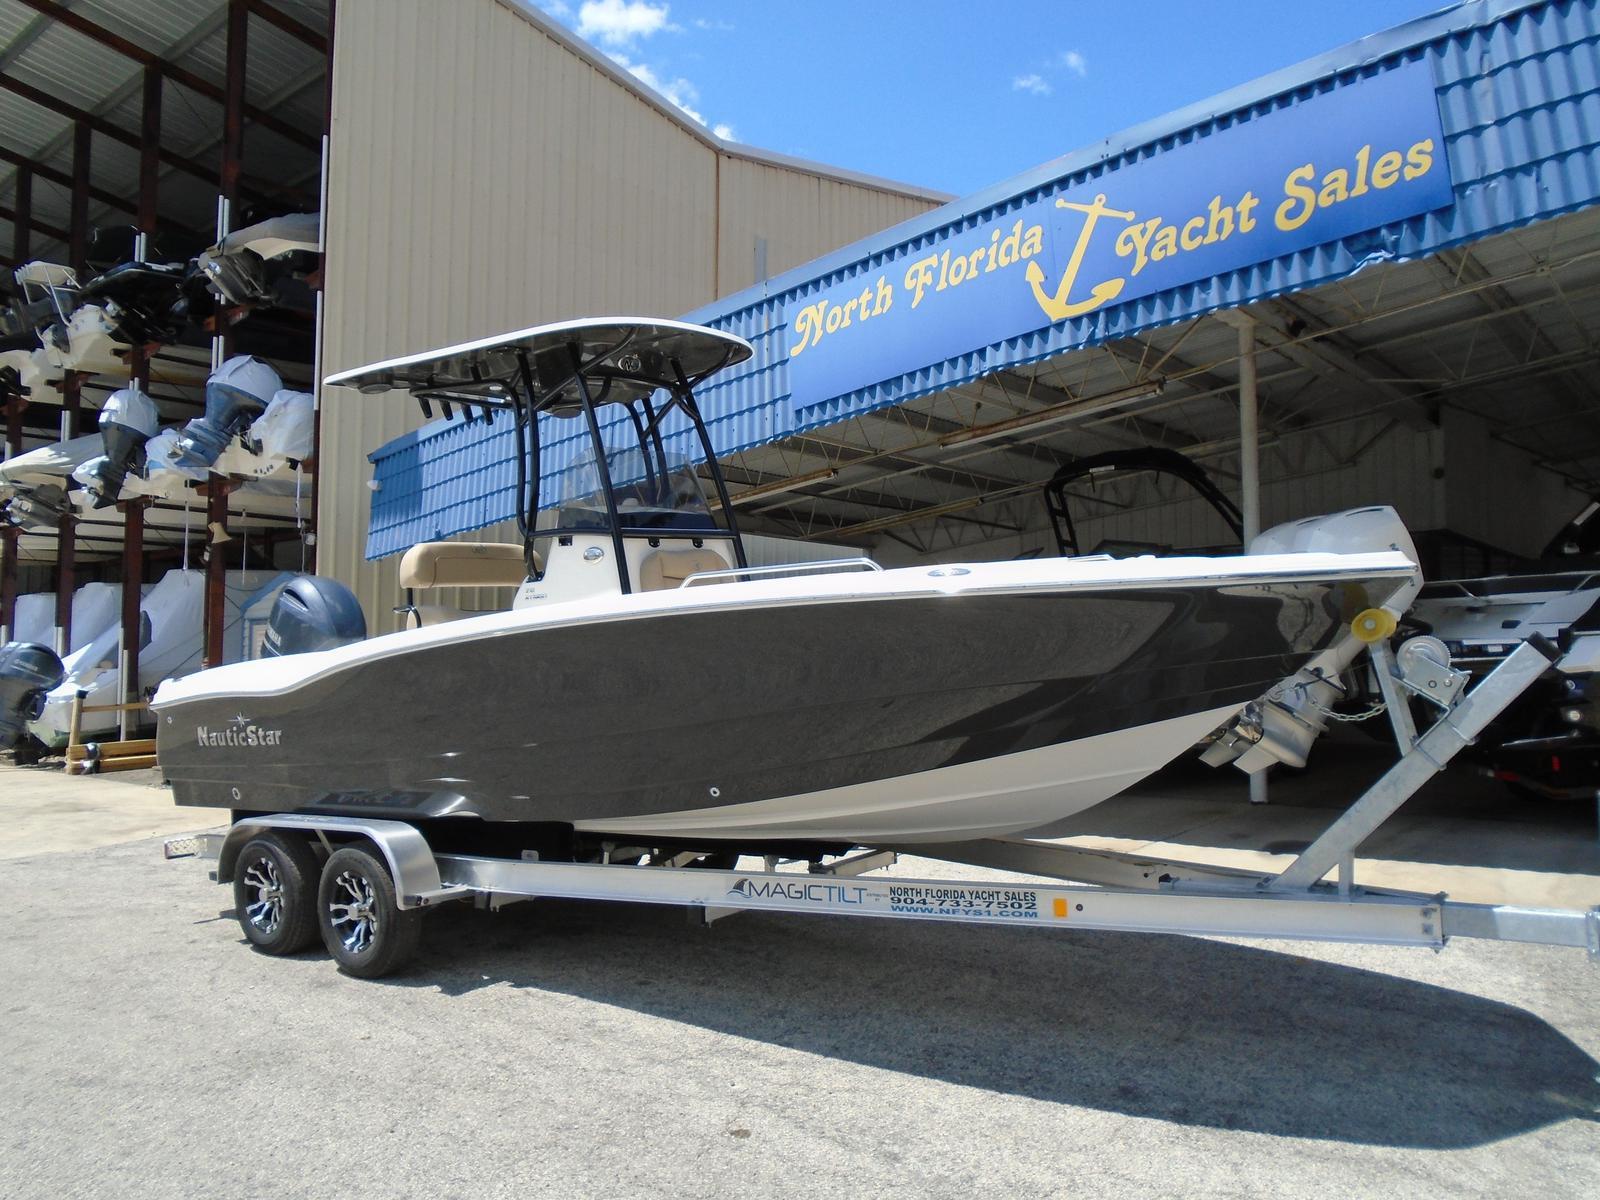 Inventory North Florida Yacht Sales Jacksonville, FL (904